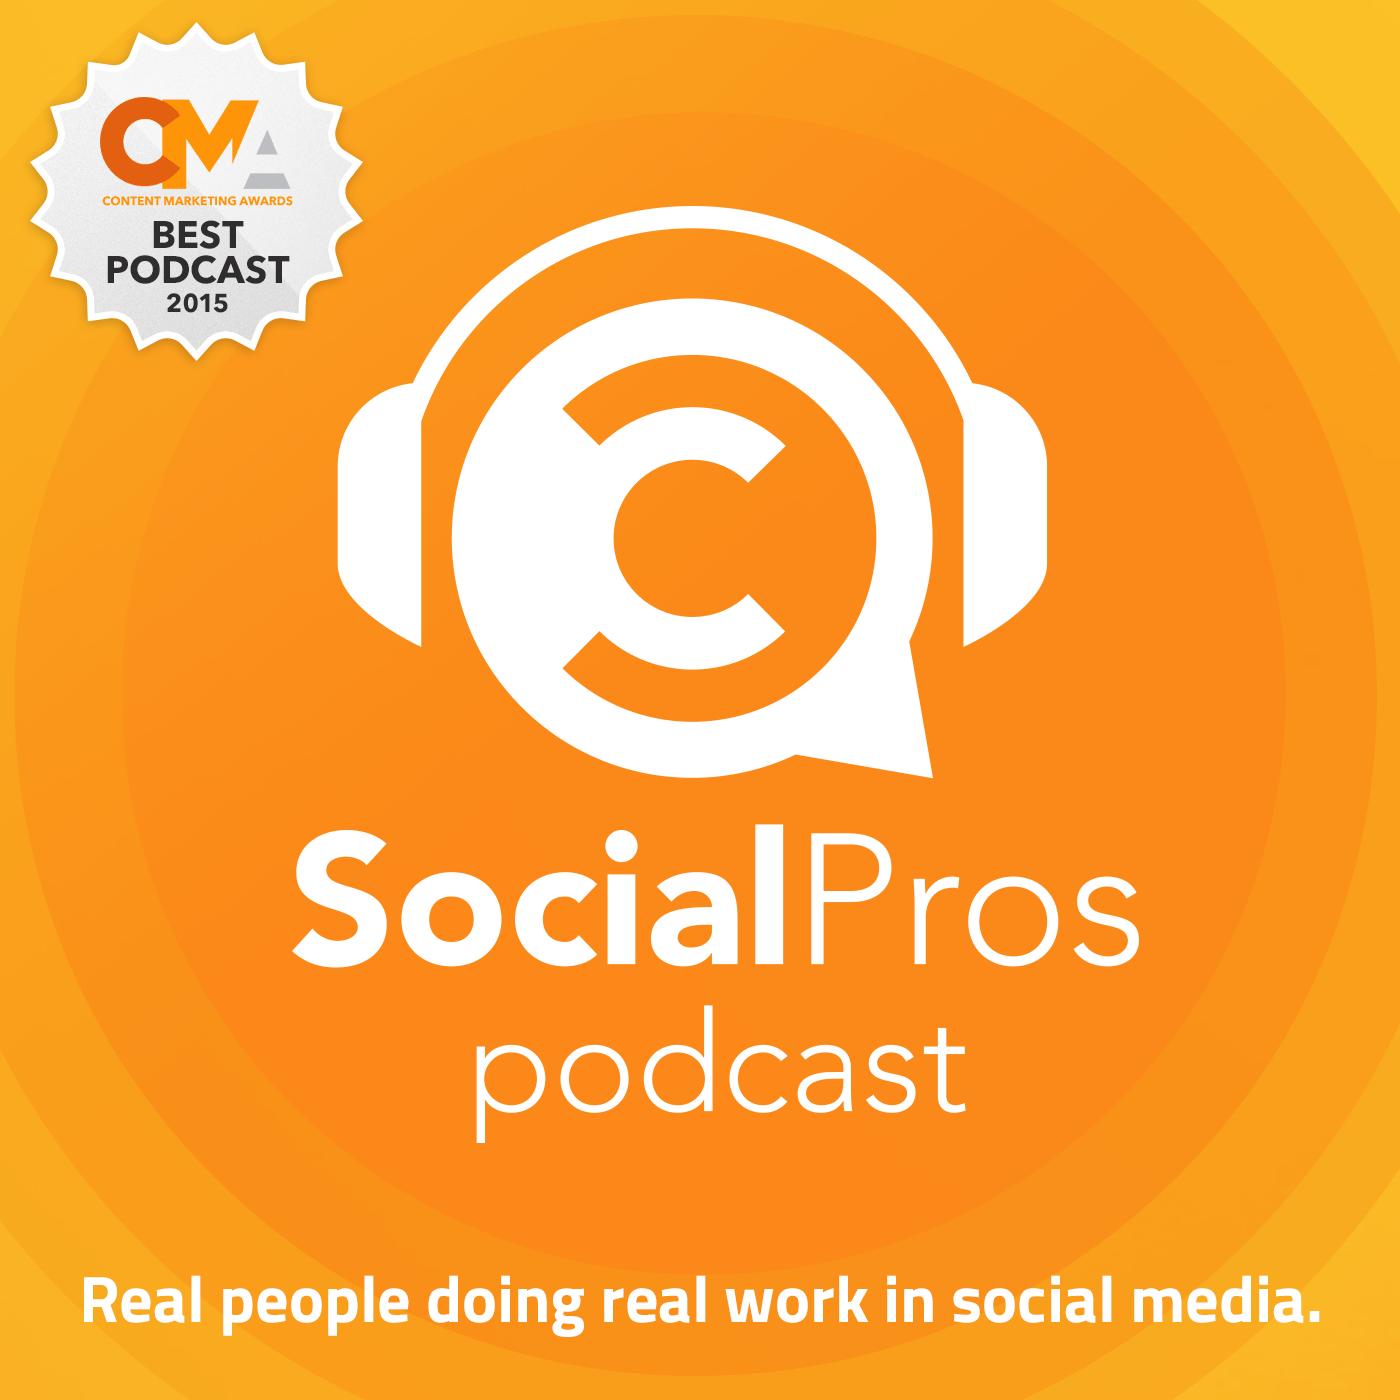 SocialPros Podcast